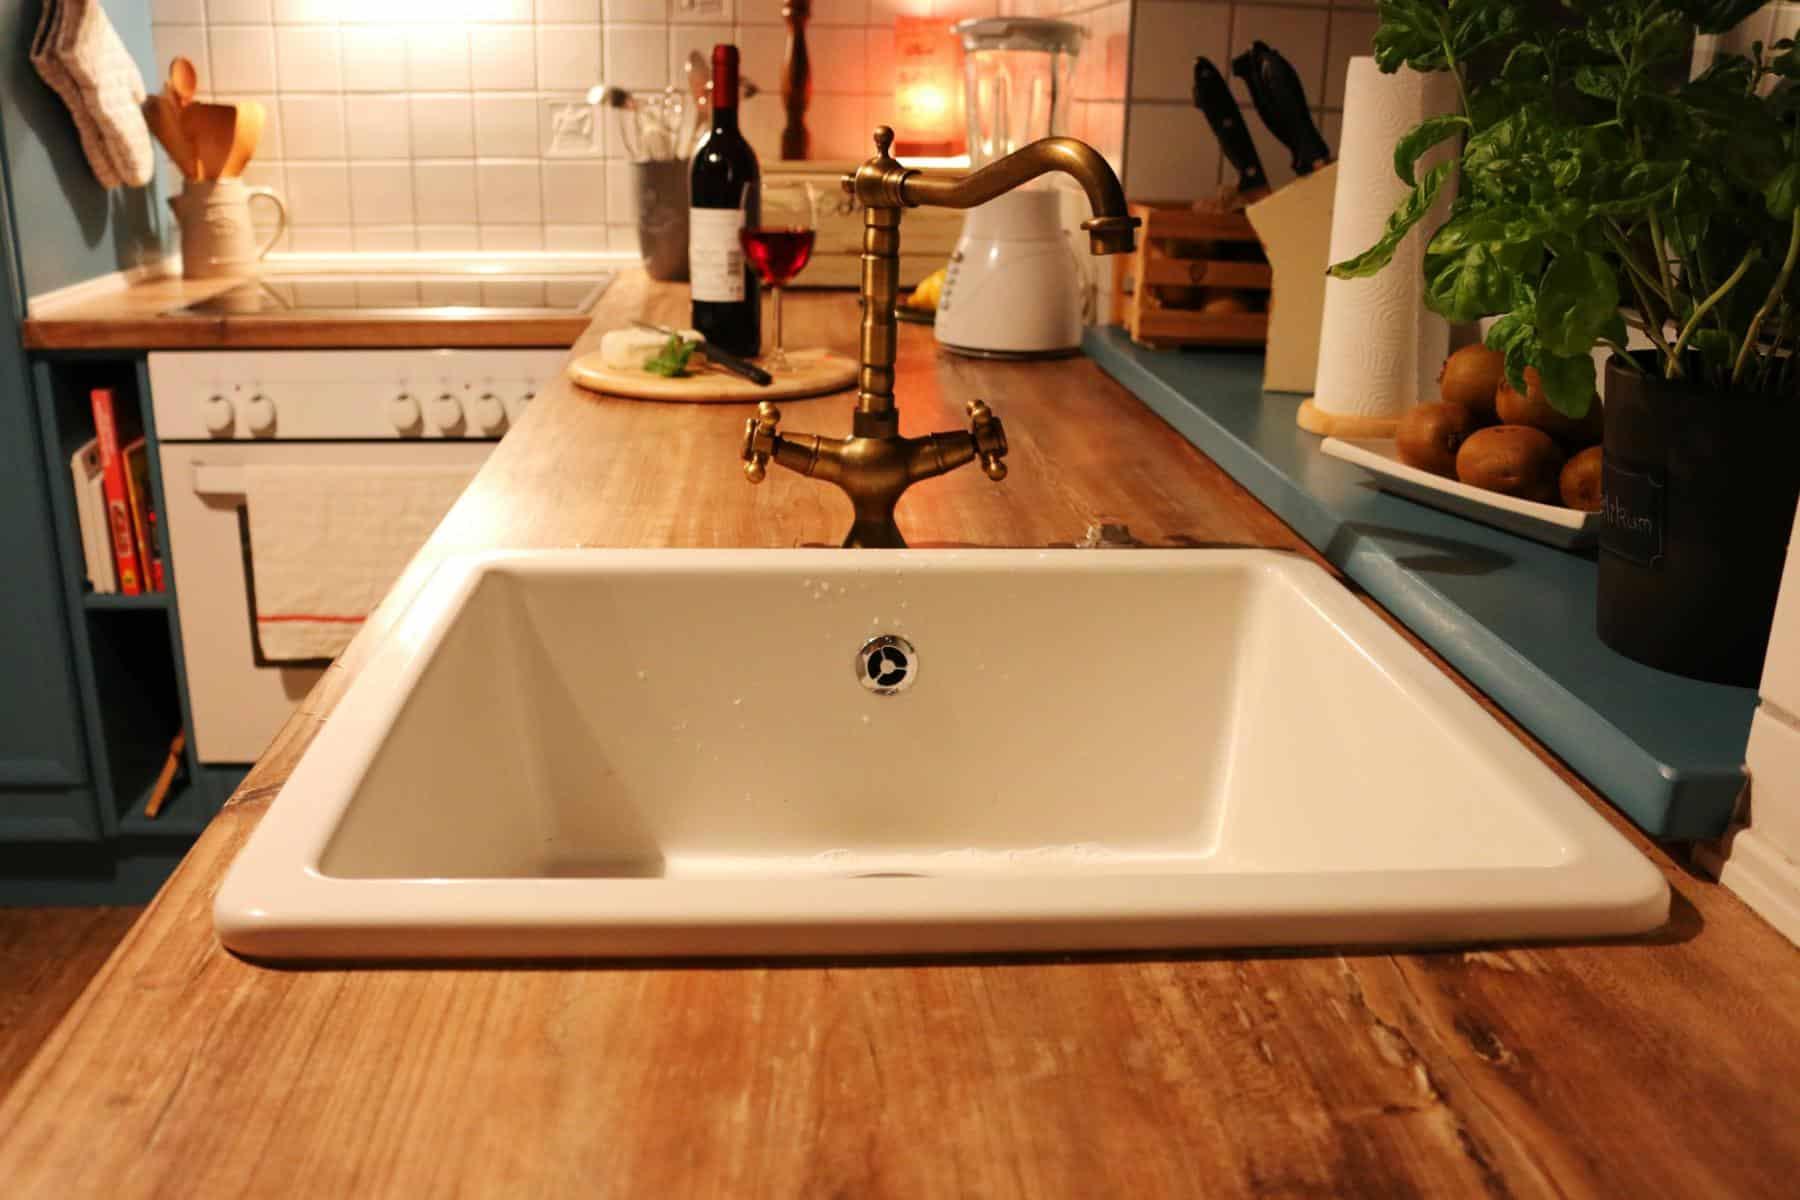 k che selber machen arbeitsplatte diy einfach selber. Black Bedroom Furniture Sets. Home Design Ideas